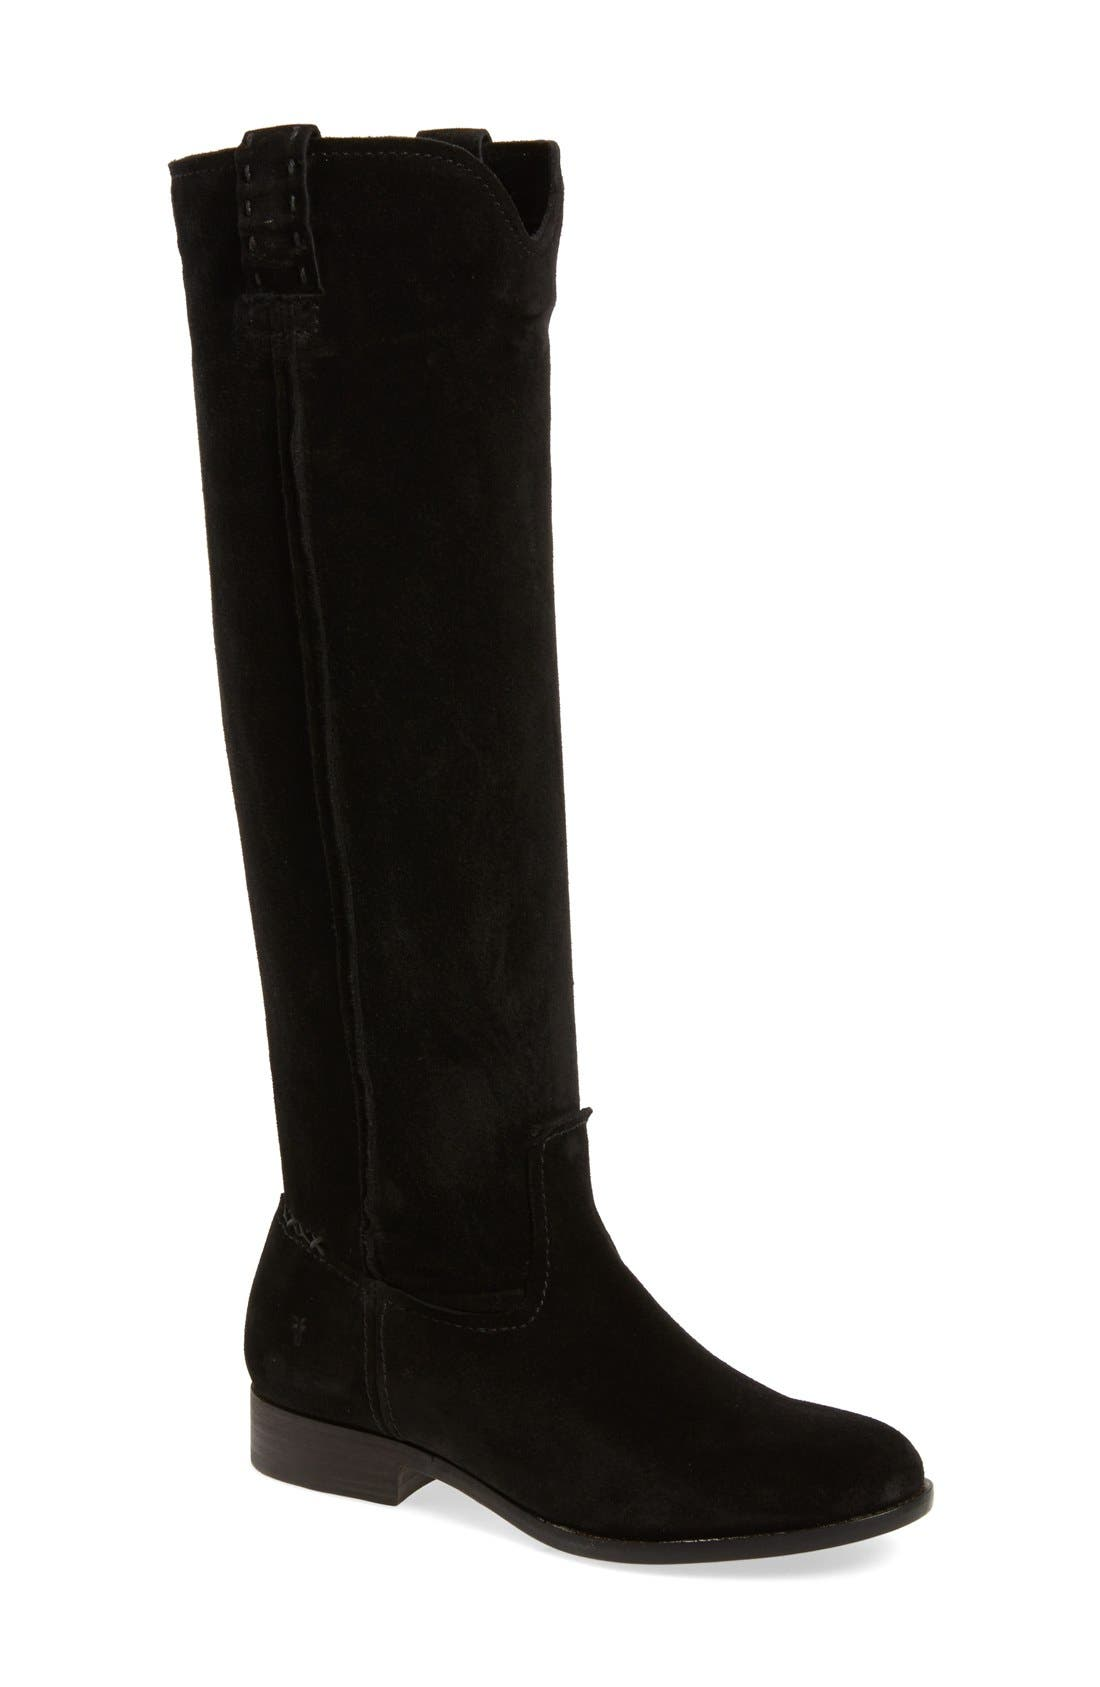 Alternate Image 1 Selected - Frye 'Cara' Tall Boot (Women)